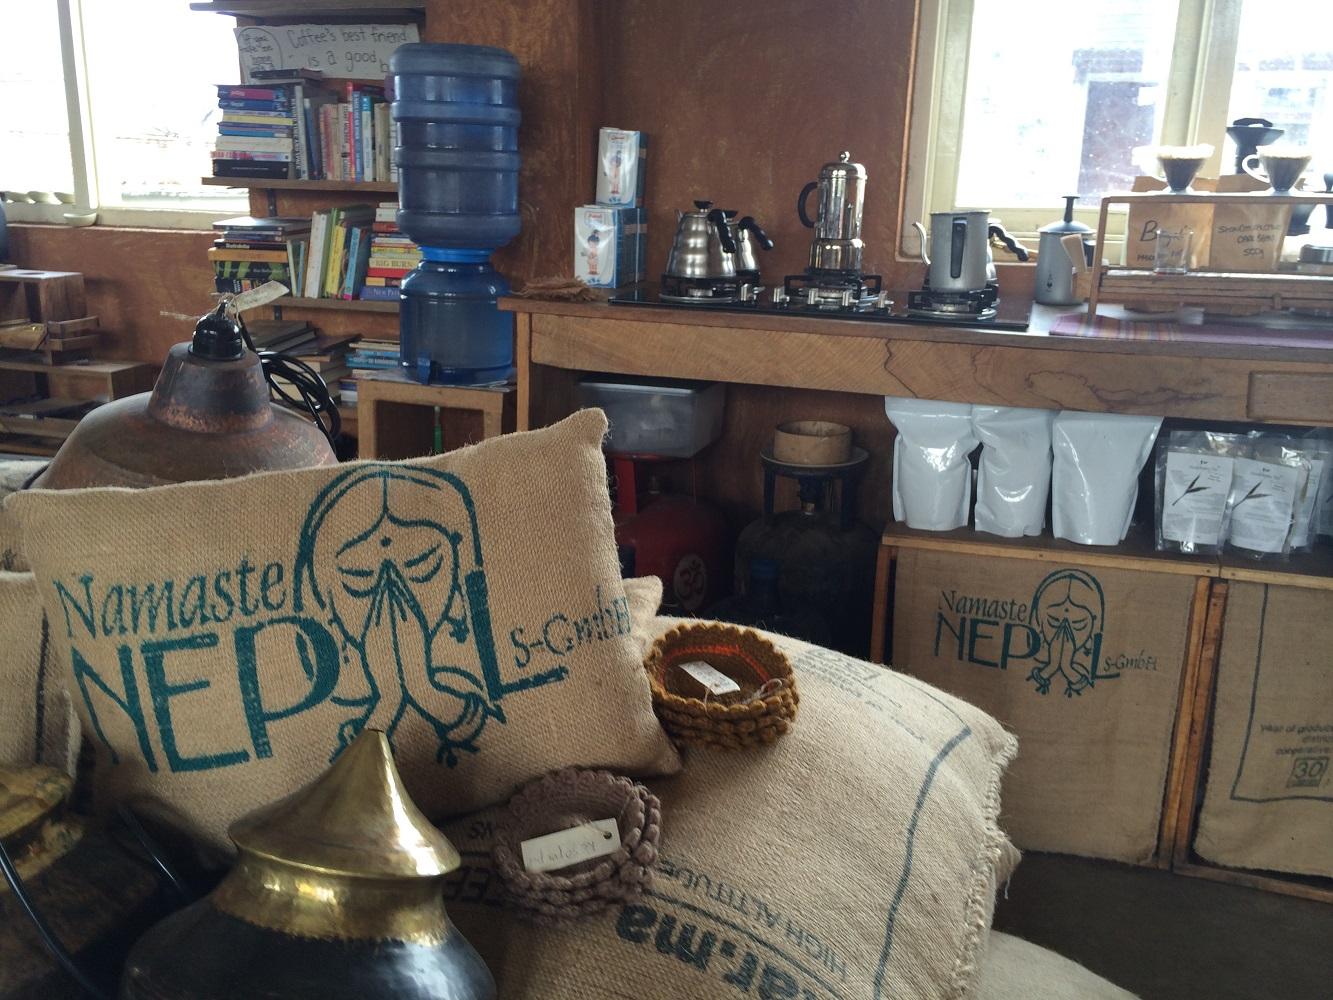 kar.ma coffee in Lalitpur tells their story in a new webzine.